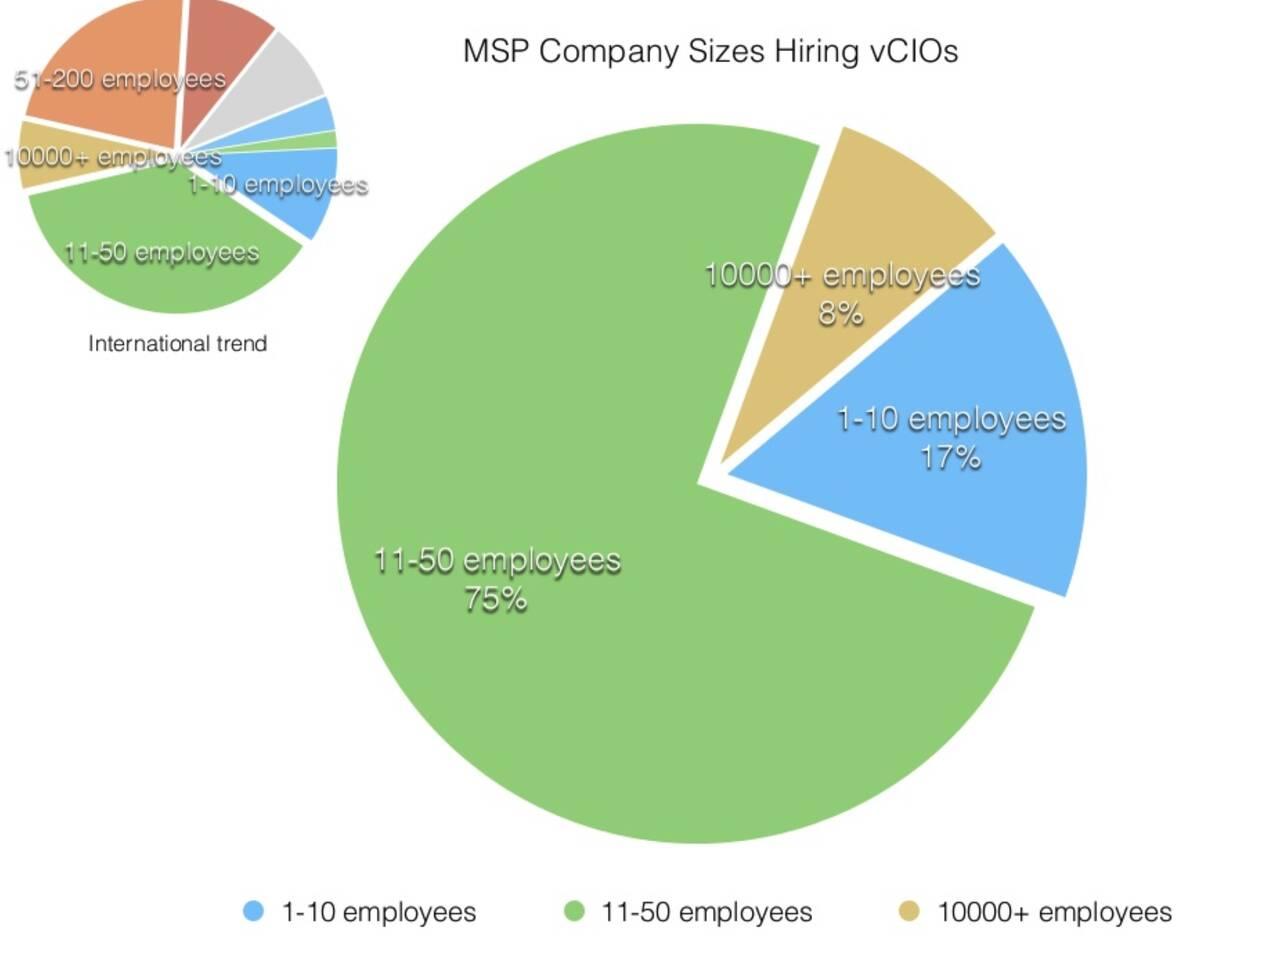 MSP company sizes hiring vCIOs in Australia